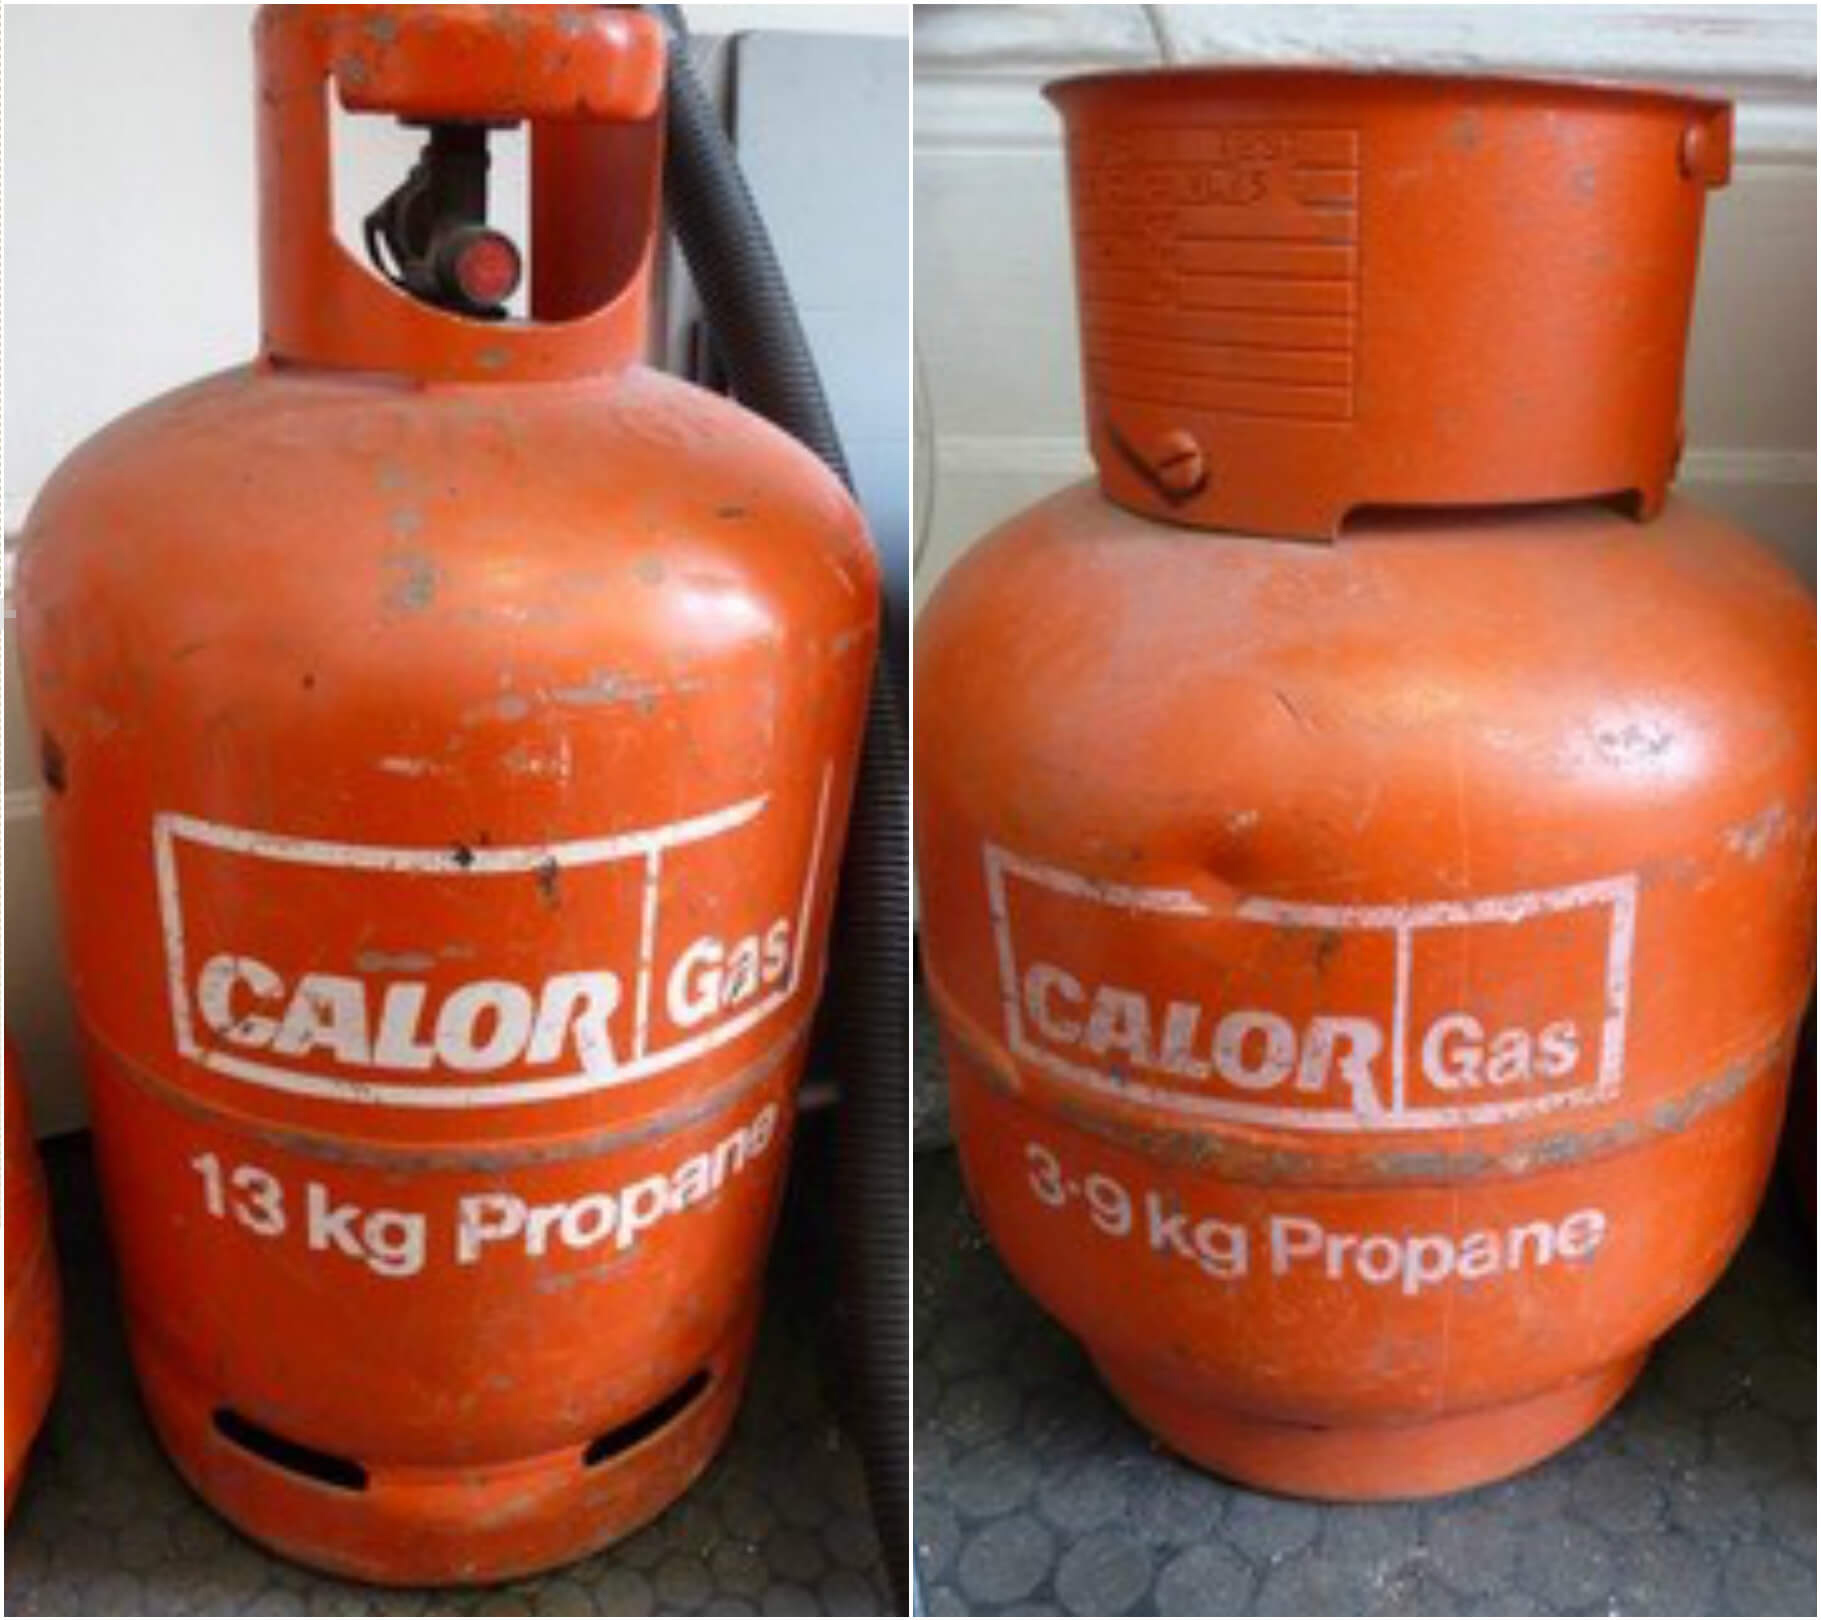 Benchpeg | For Sale: Two Propane Gas Bottles